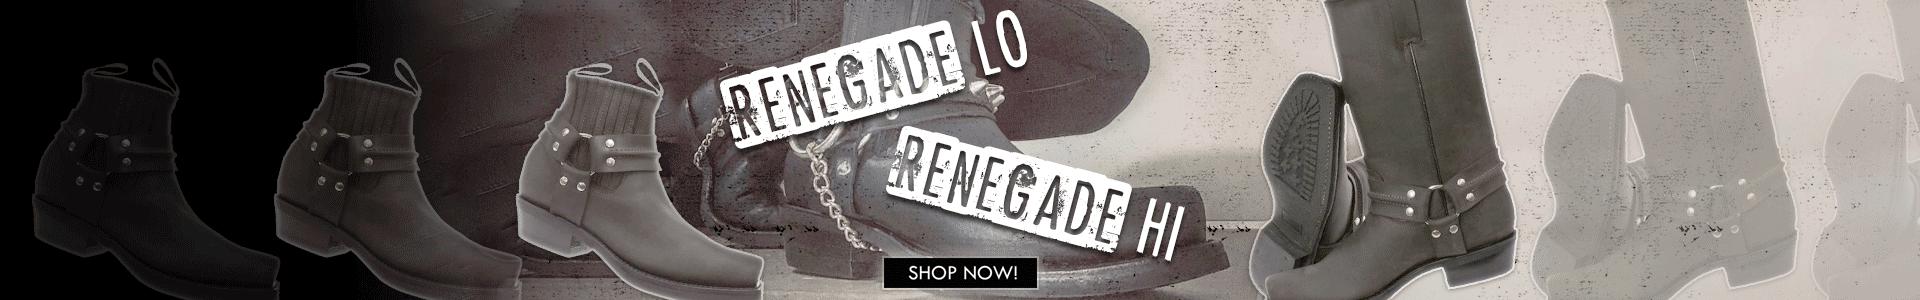 Shop Grinders Renegade